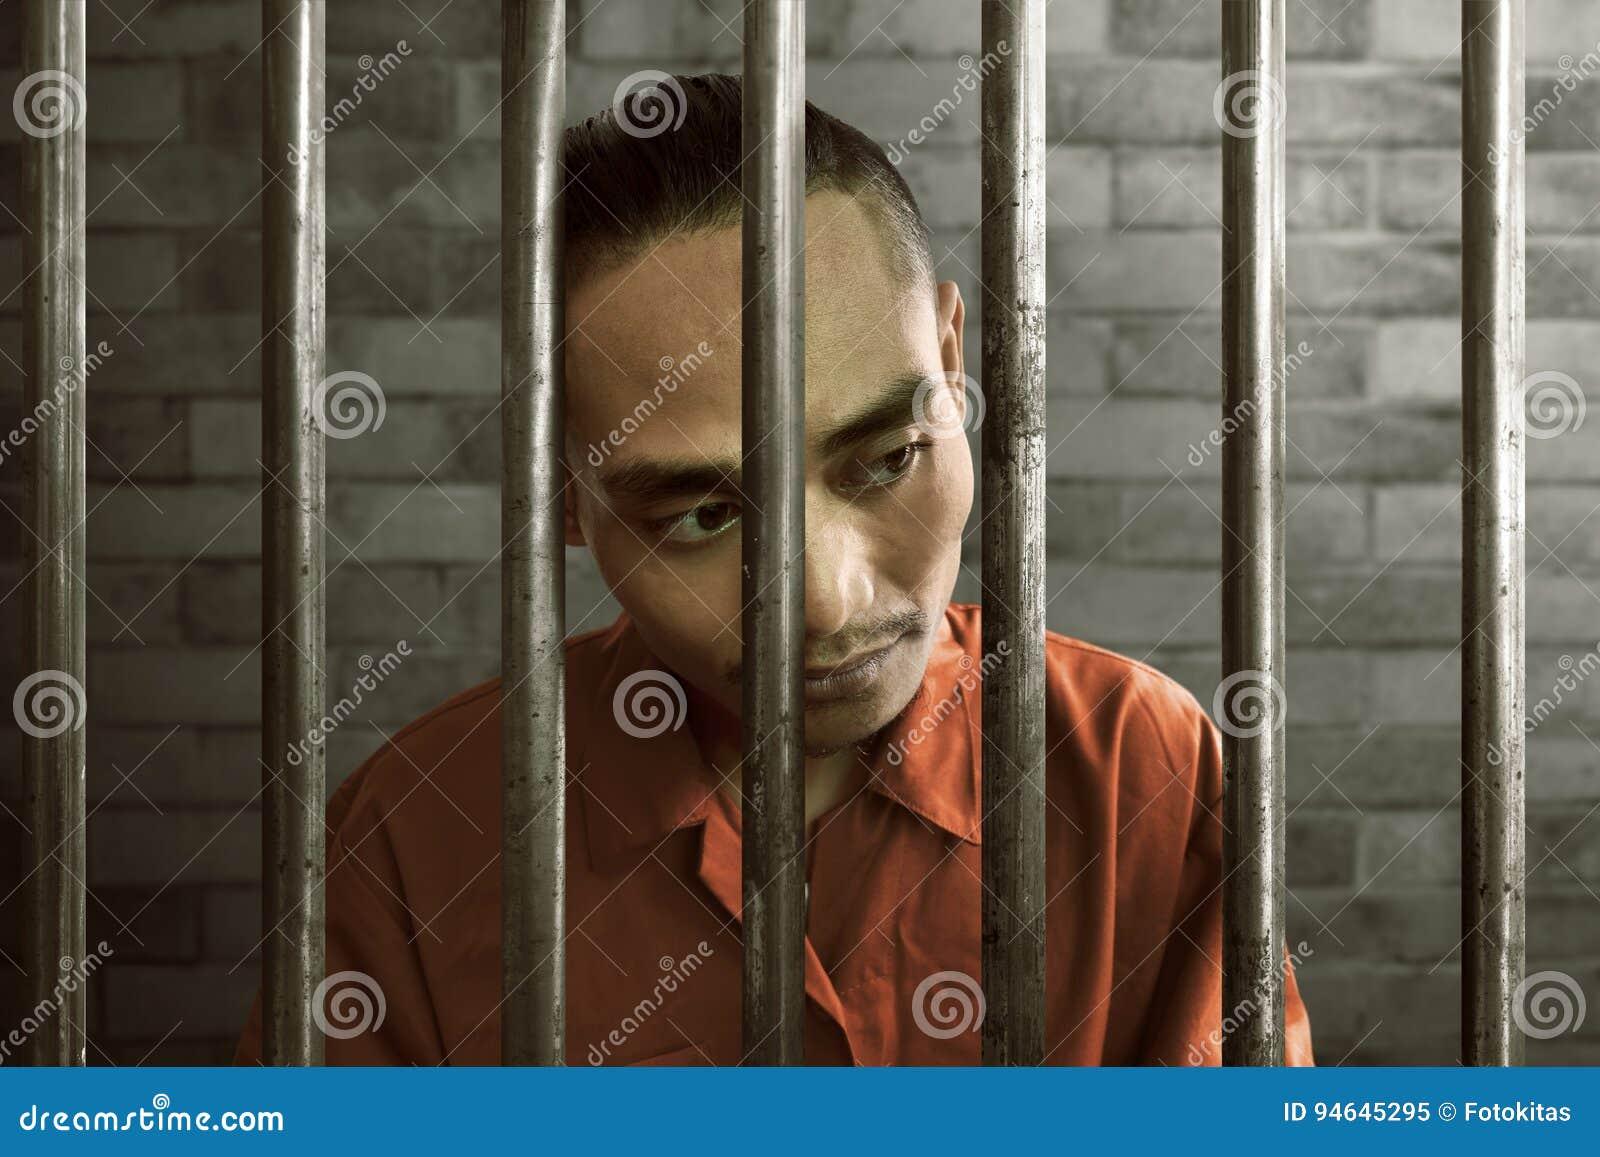 prison Asian in